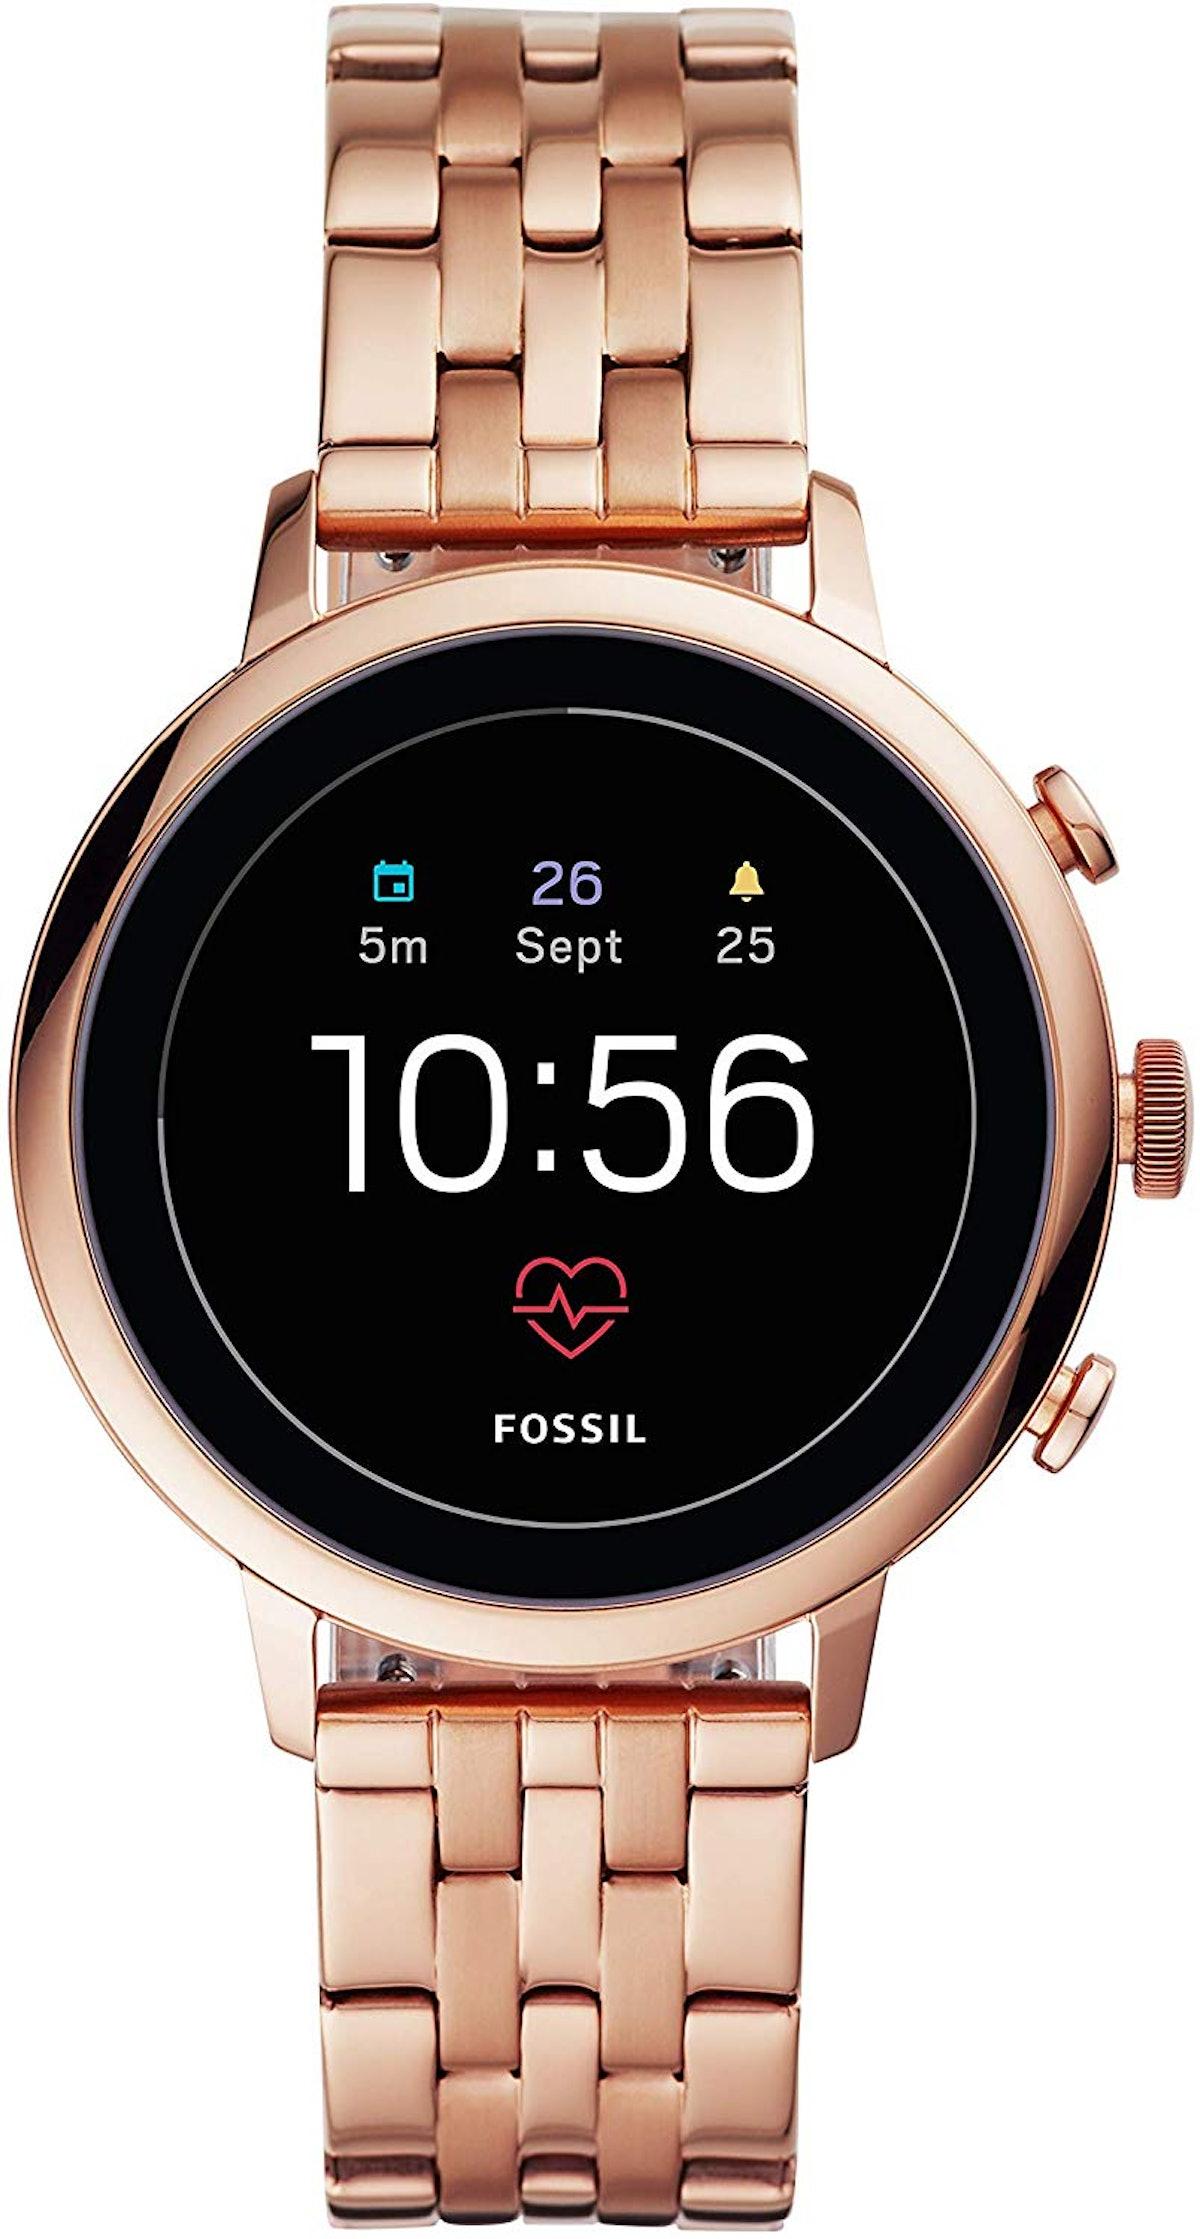 Fossil Women's Gen 4 Venture HR Heart Rate Stainless Steel Touchscreen Smartwatch, Rose Gold 5-Link